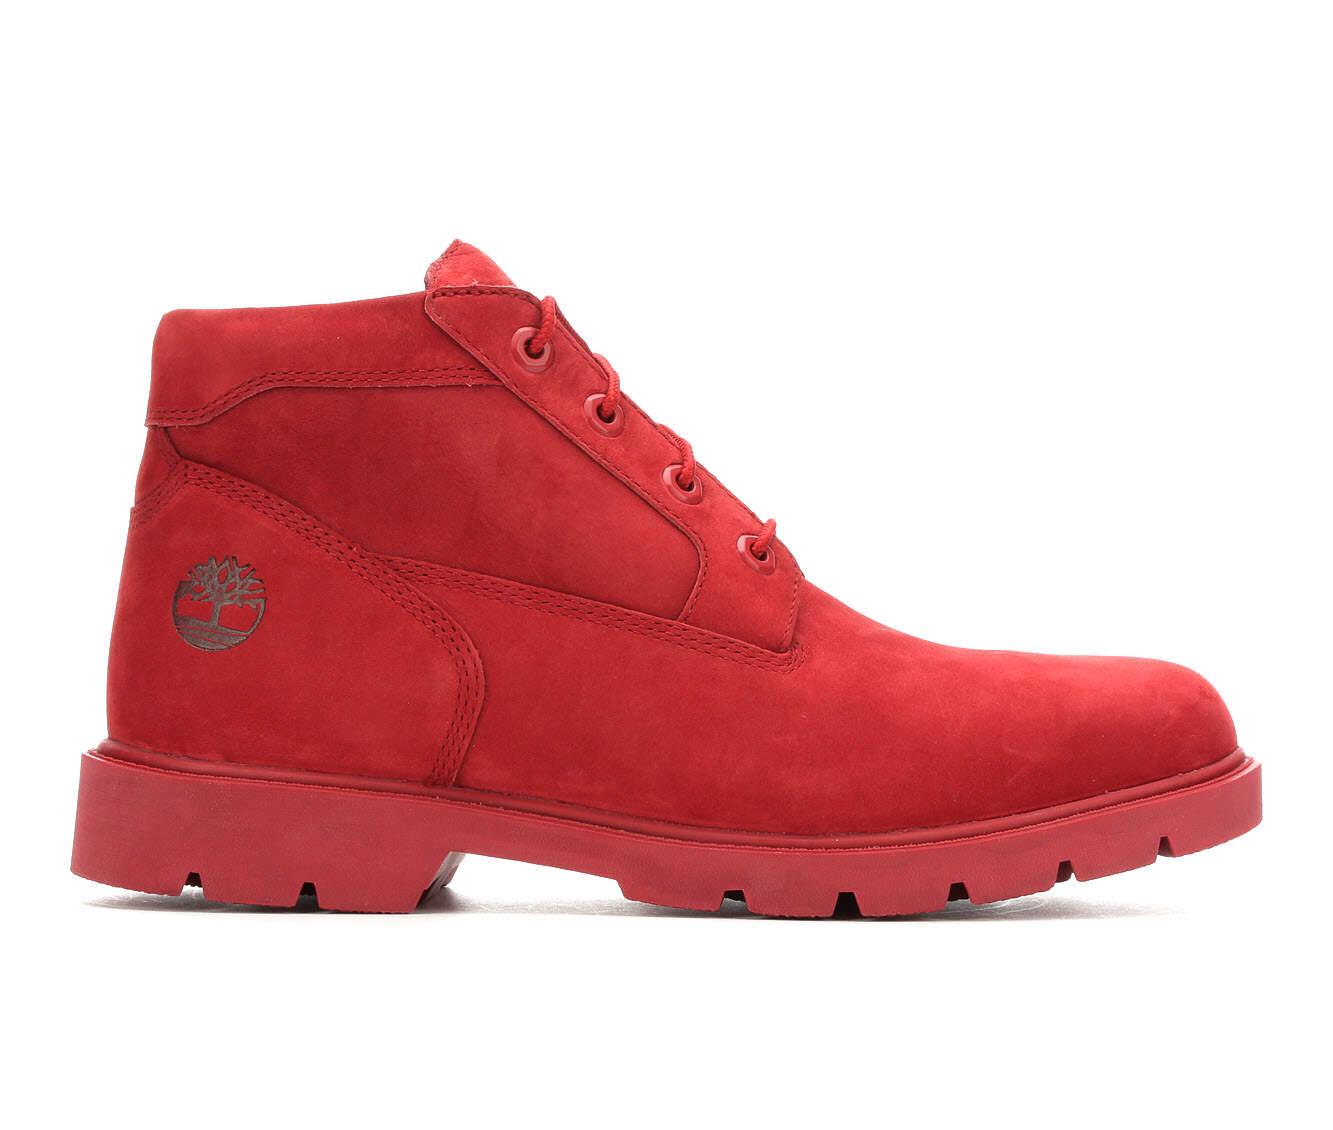 Men's Timberland Basic Chukka Boots Red